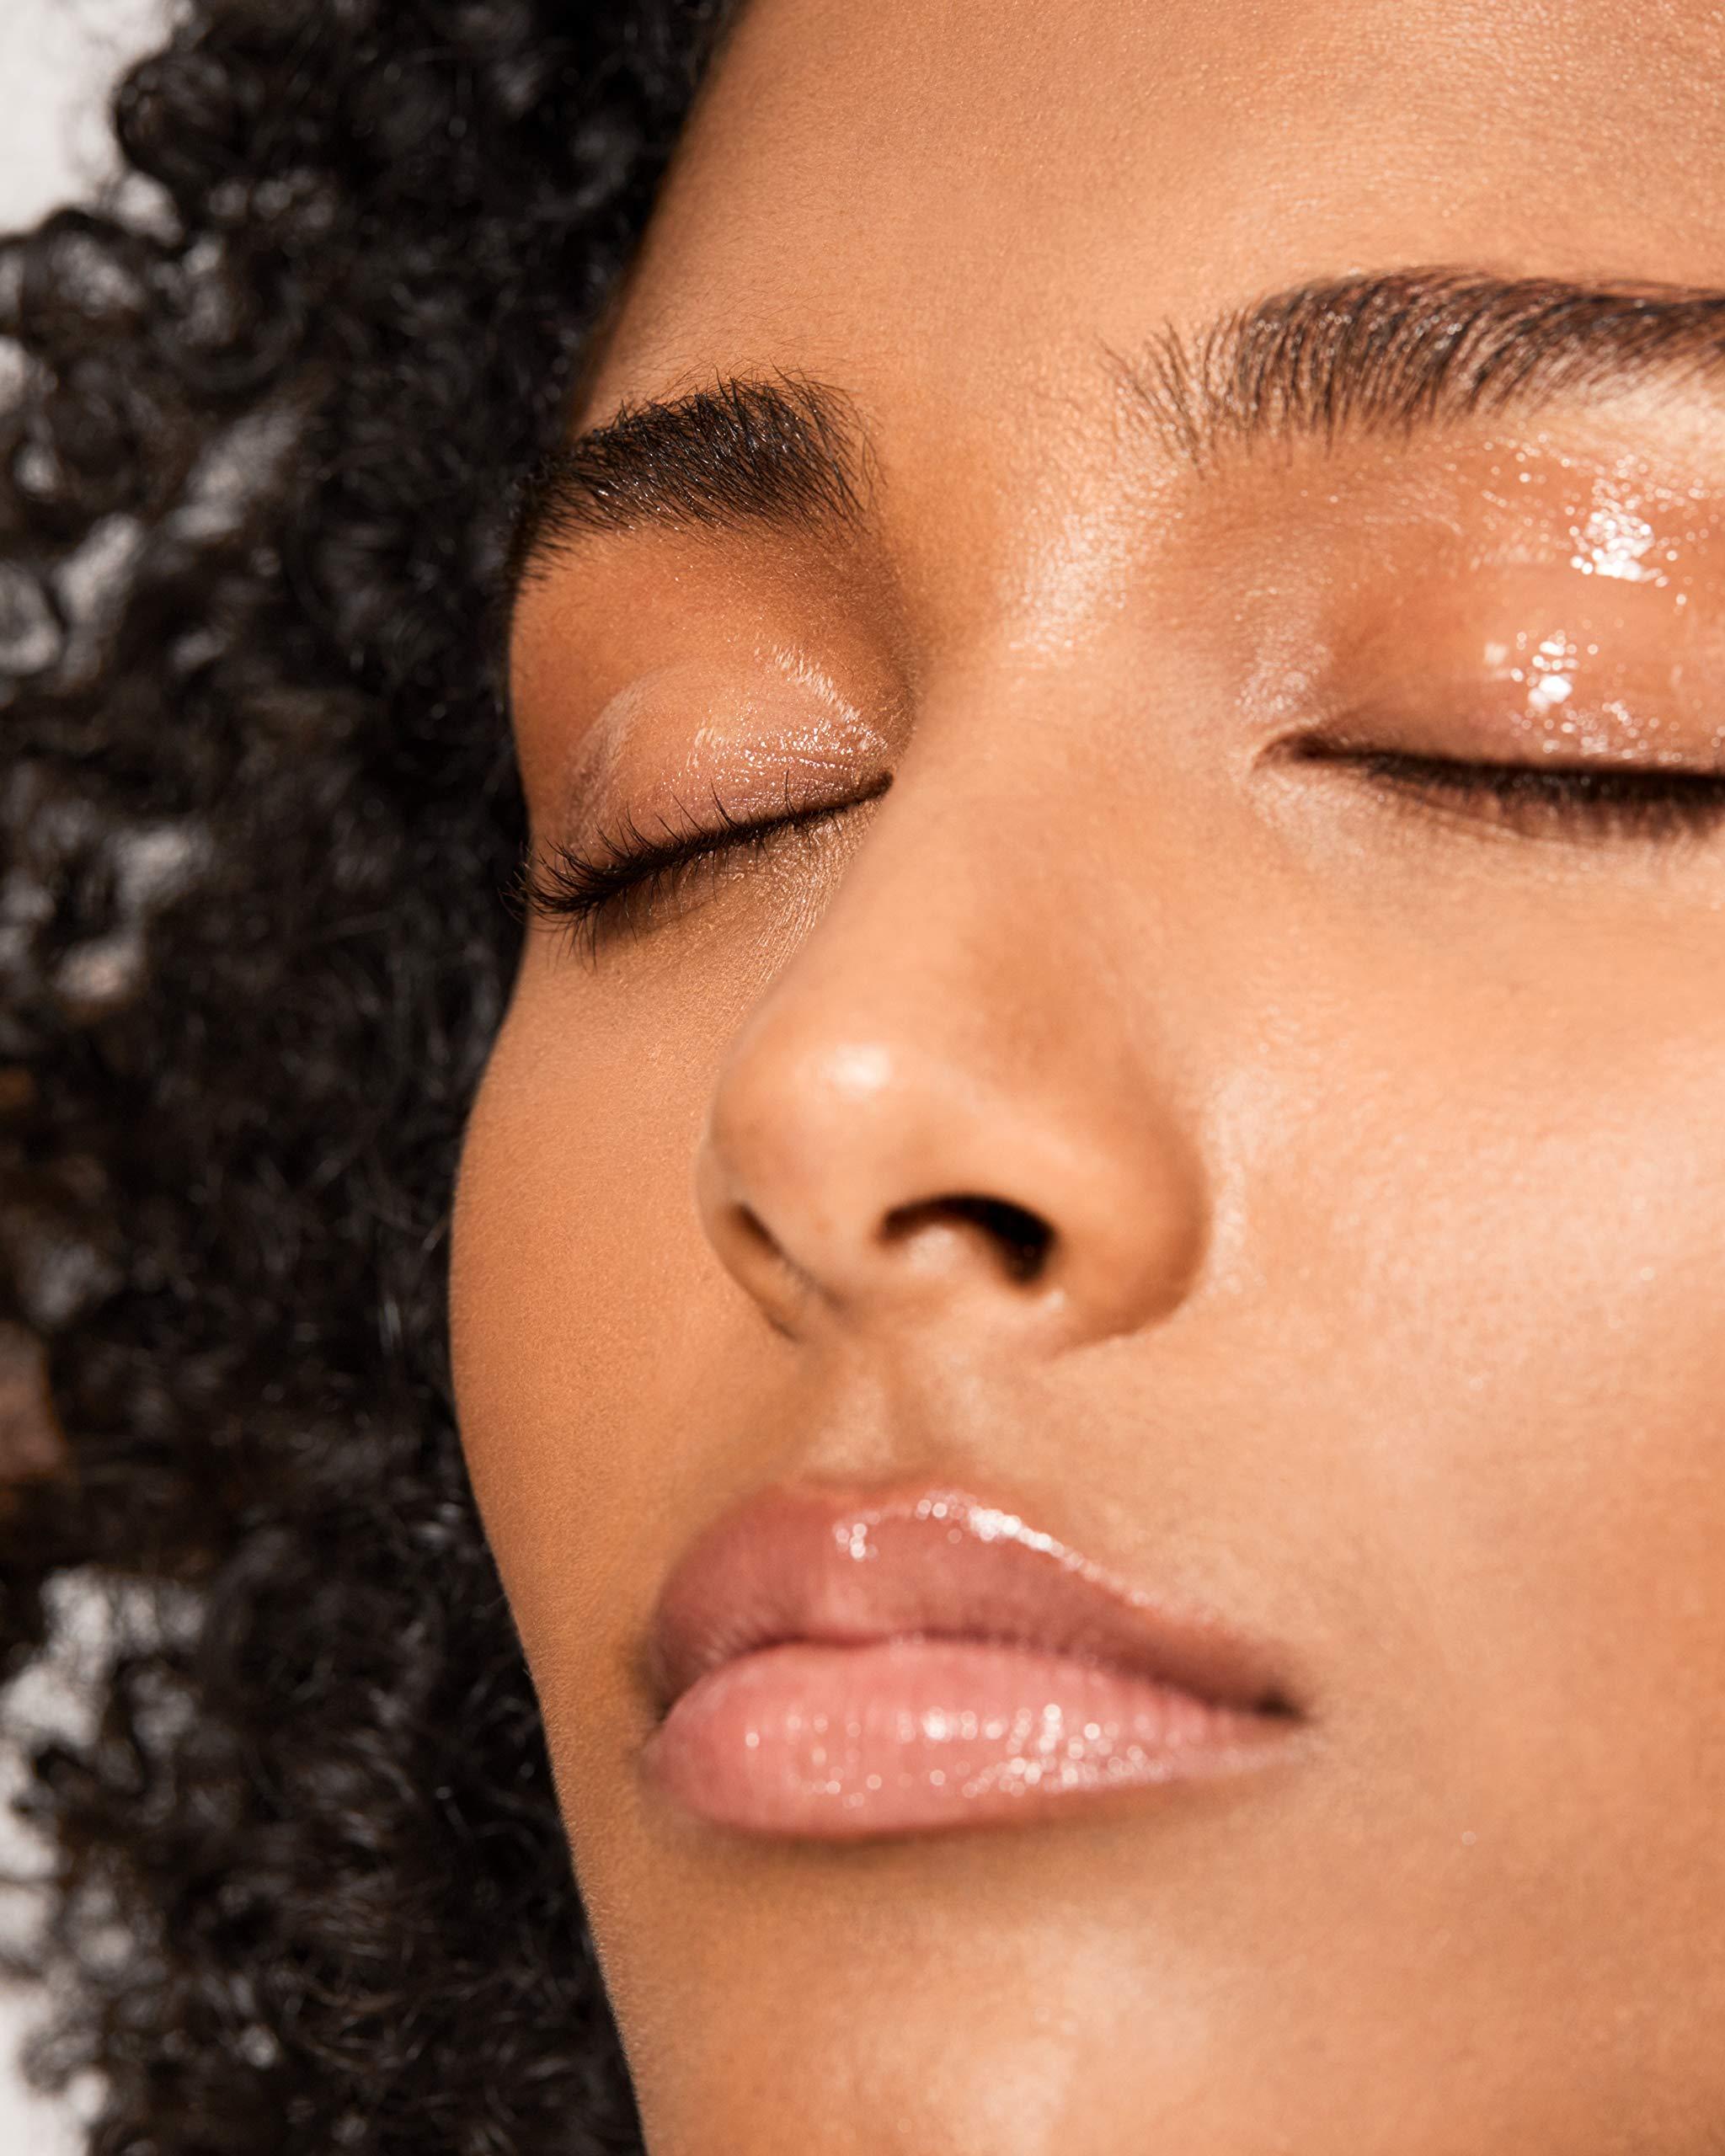 Elizabeth Arden Eight Hour Skin Protectant Cream, Fragrance Free, 1.7 oz. by Elizabeth Arden (Image #4)